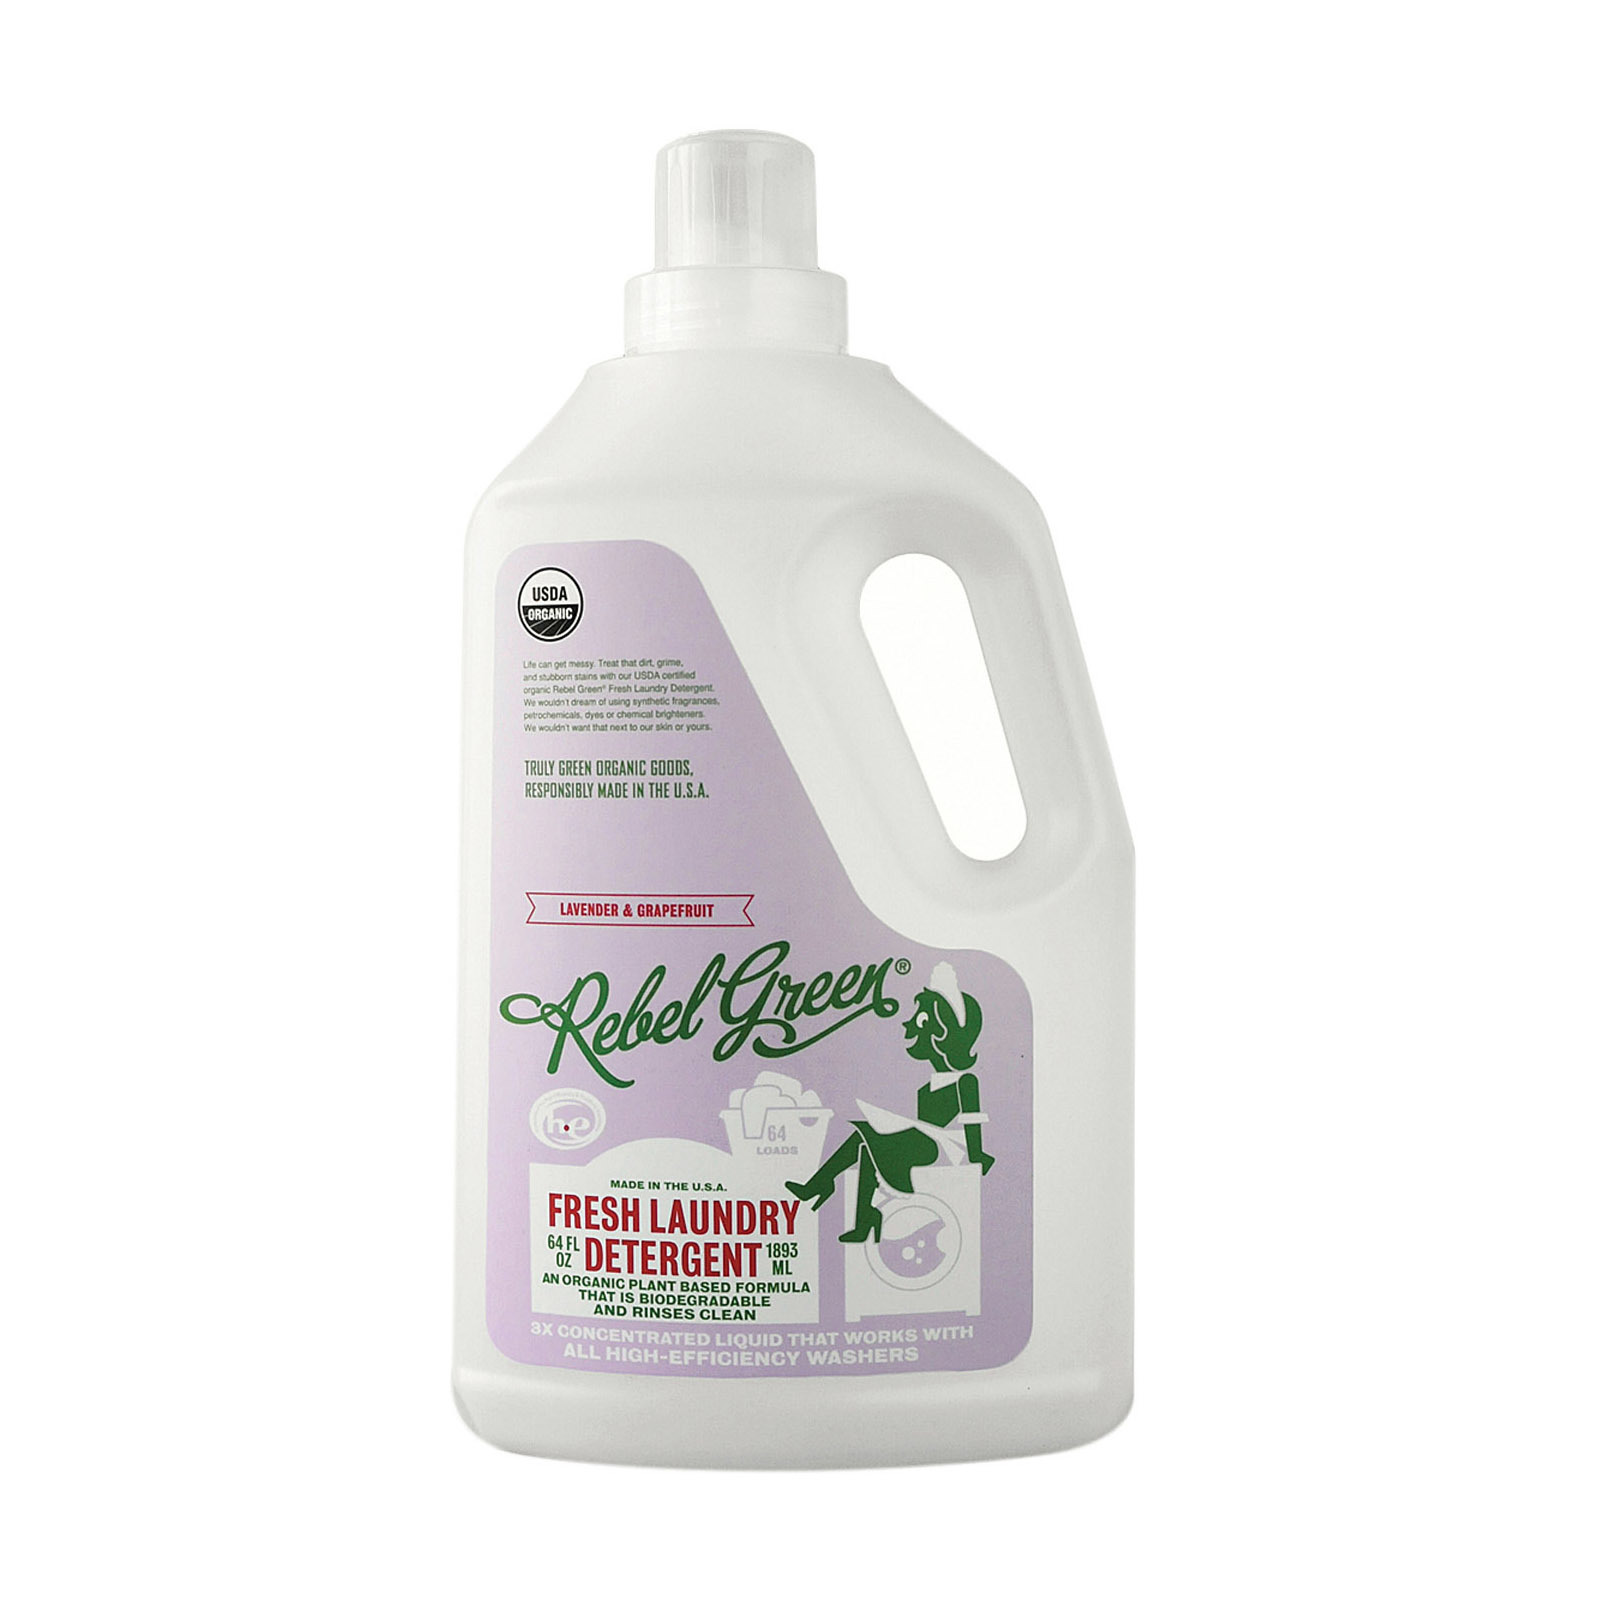 Rebel Green Laundry Detergent - Lavender and Grapefruit - Case of 4 - 64 fl oz